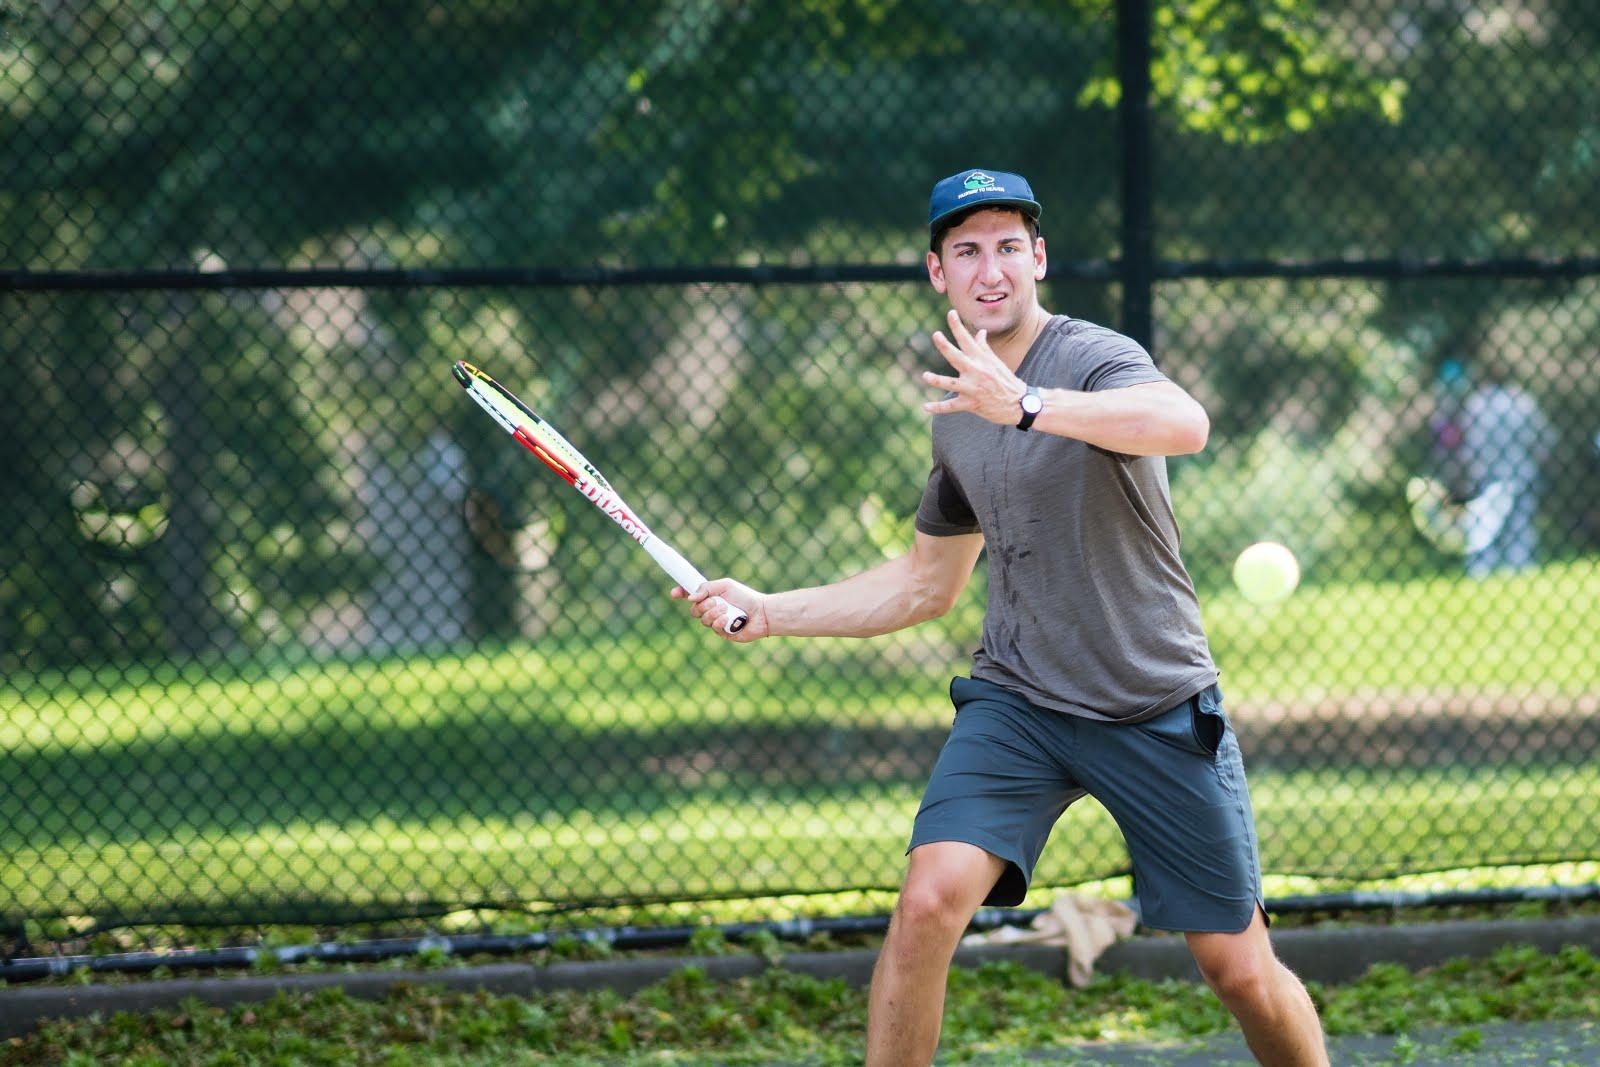 Men's singles player. Photo credit: Duy Tran